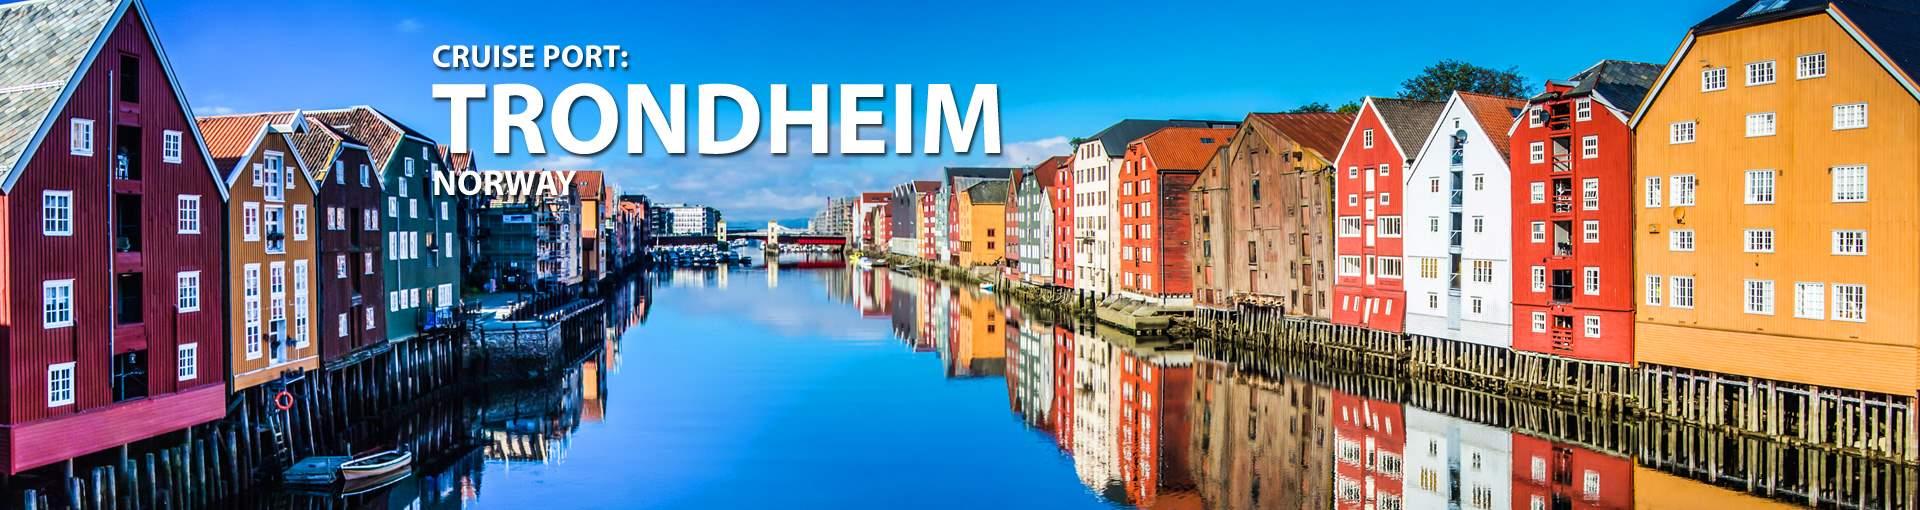 Cruise to Trondheim, Norway